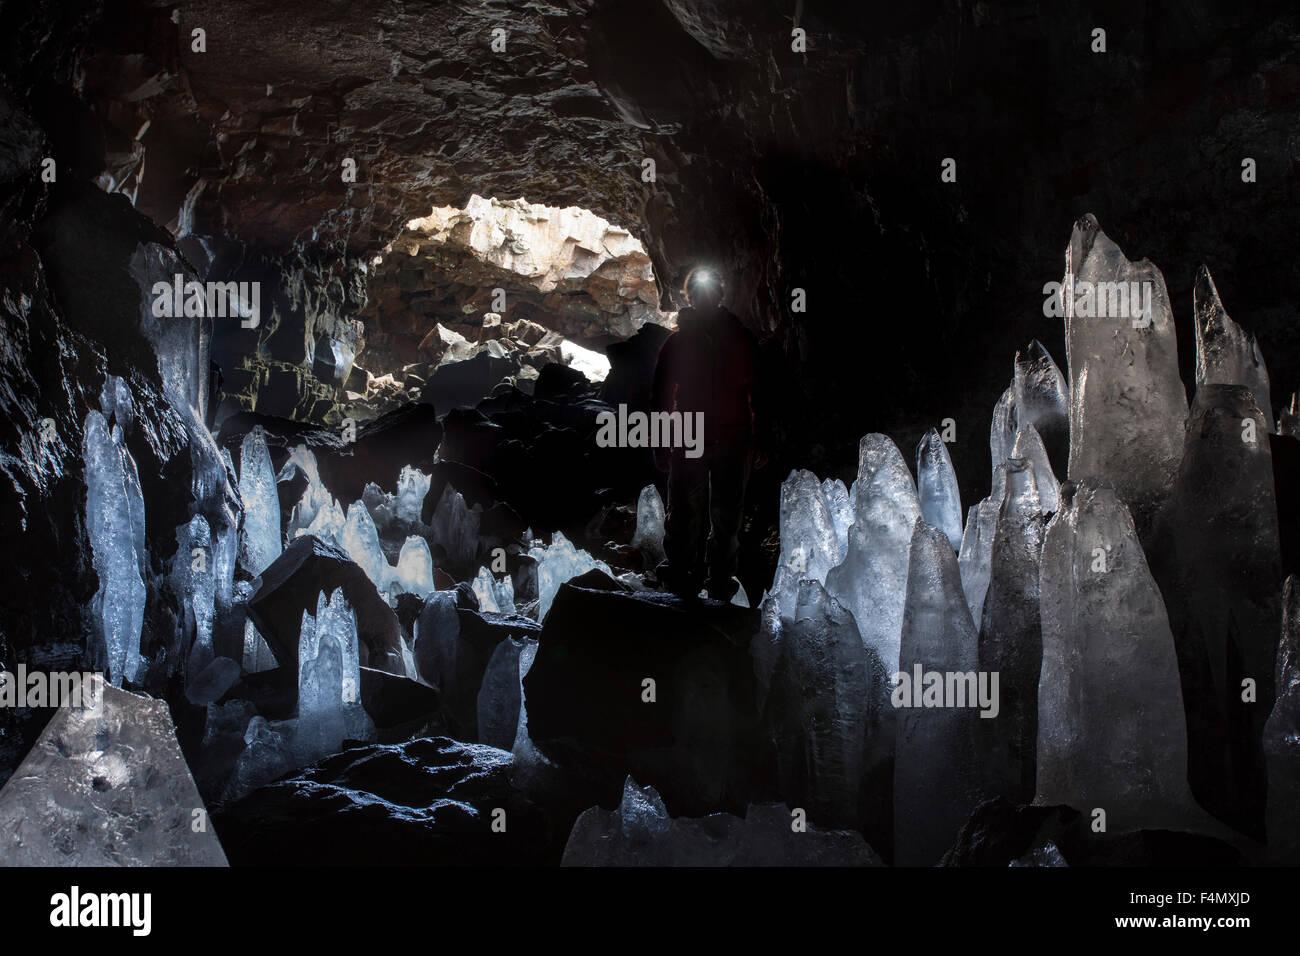 Person amongst ice stalagmites in Raufarholshellir lava tube, near Hveragerdi, Sudherland, Iceland. - Stock Image